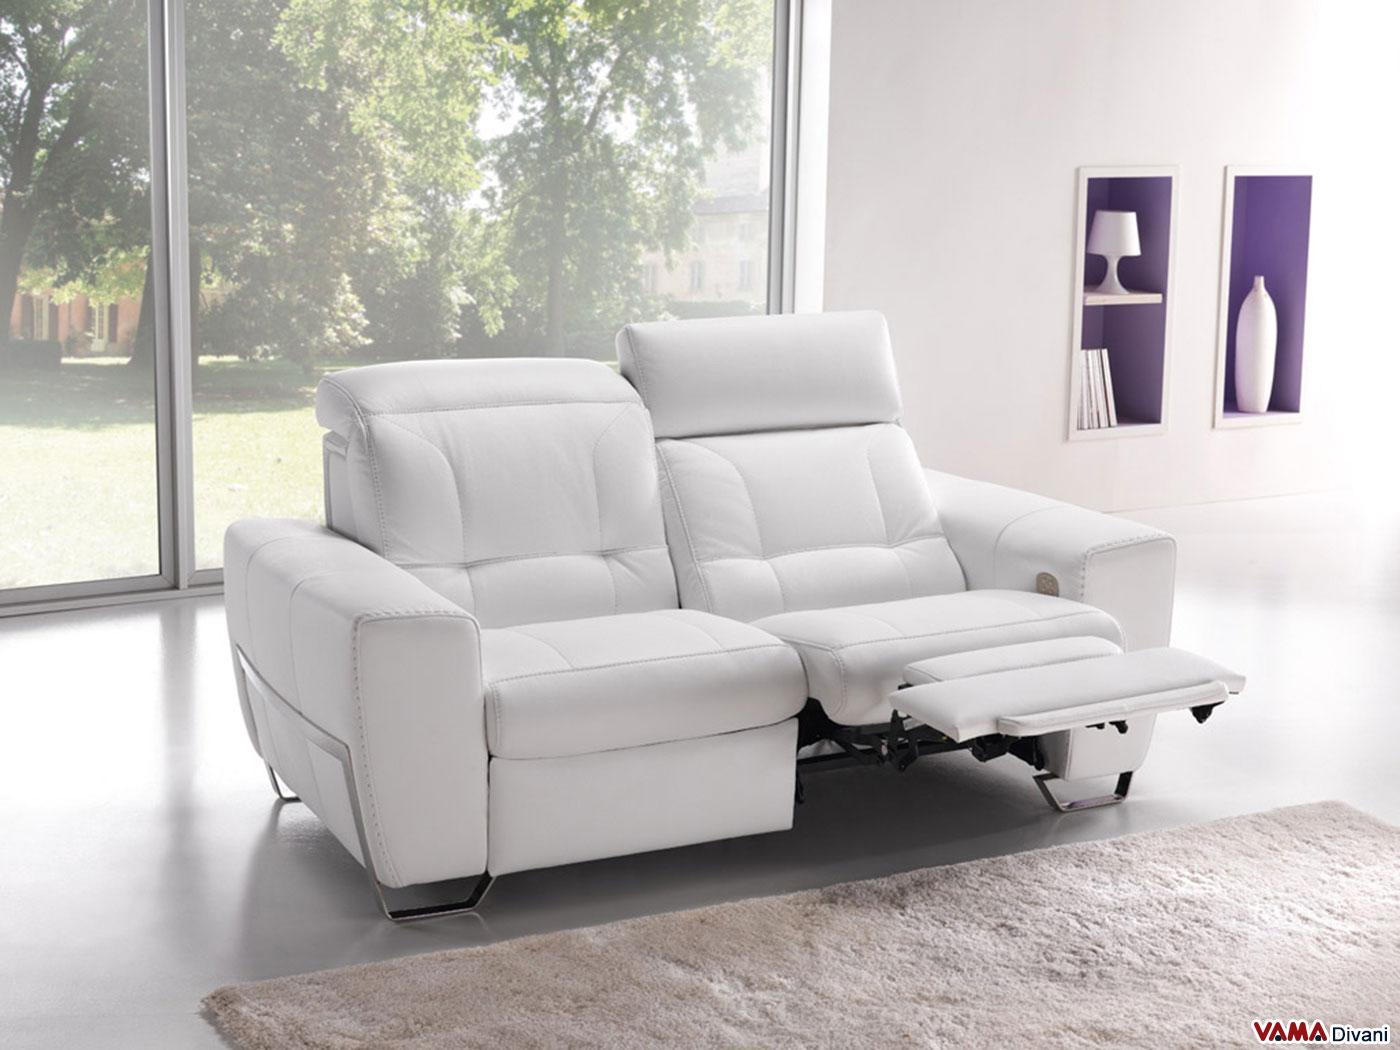 Vama divani blog divano relax l 39 accattivante stile for Divani e divani relax